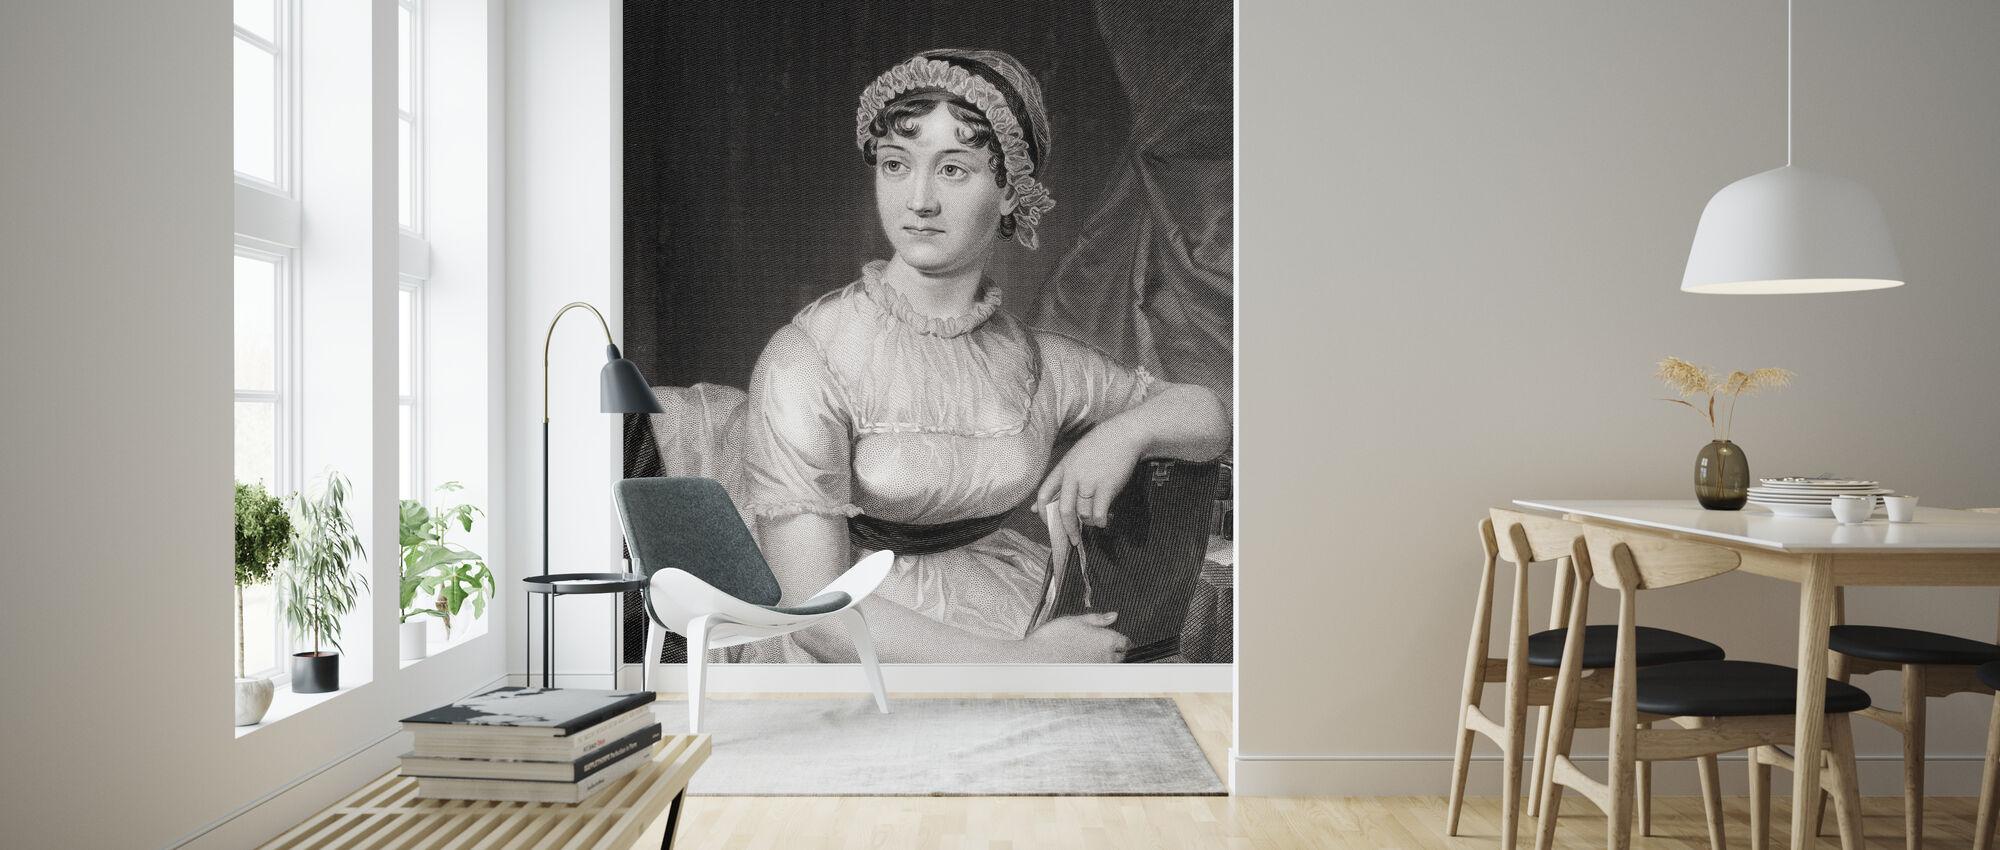 Jane Austen - Wallpaper - Living Room